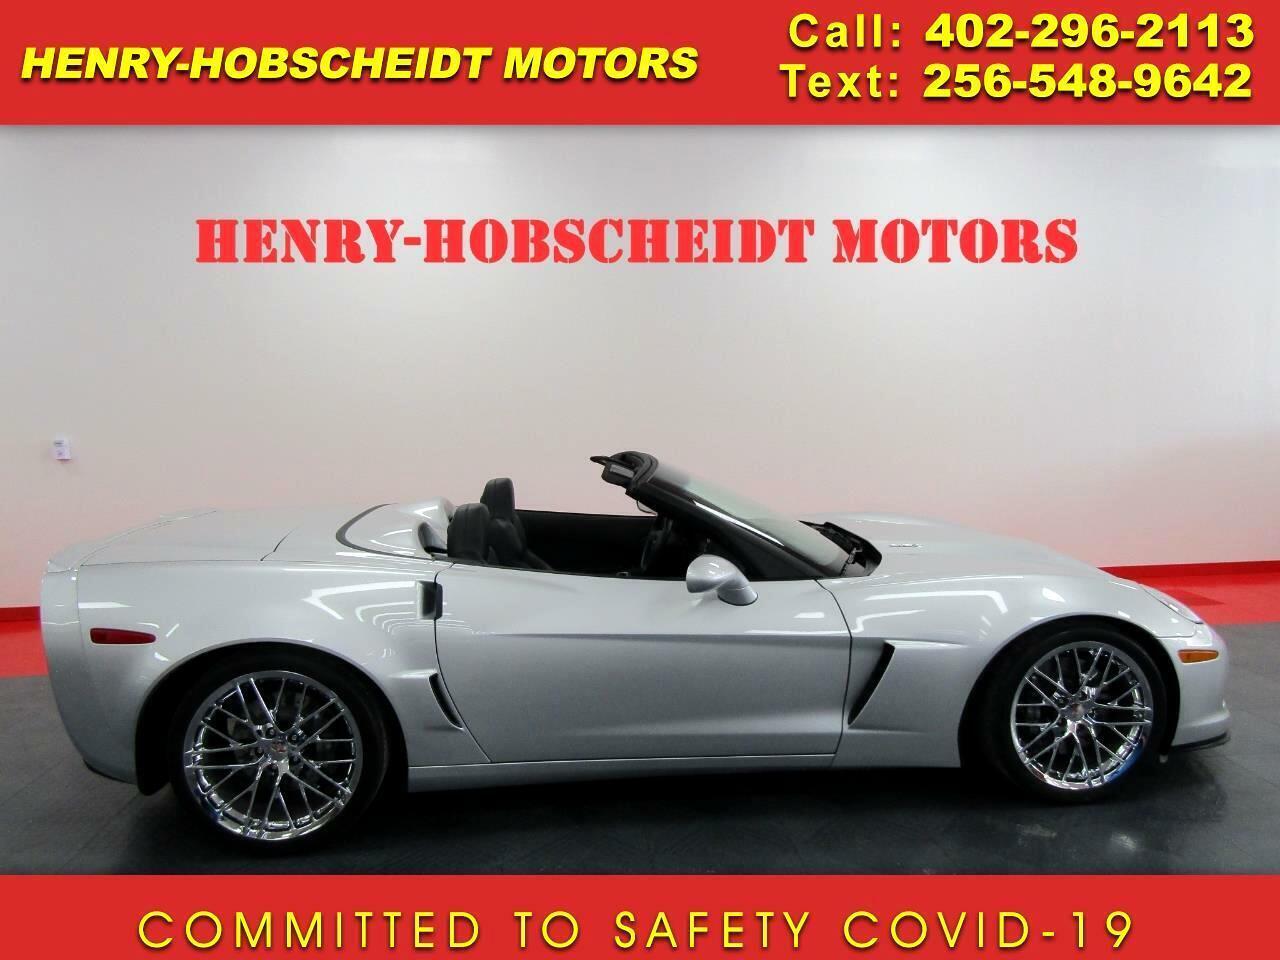 2013 Silver Chevrolet Corvette Convertible  | C6 Corvette Photo 1